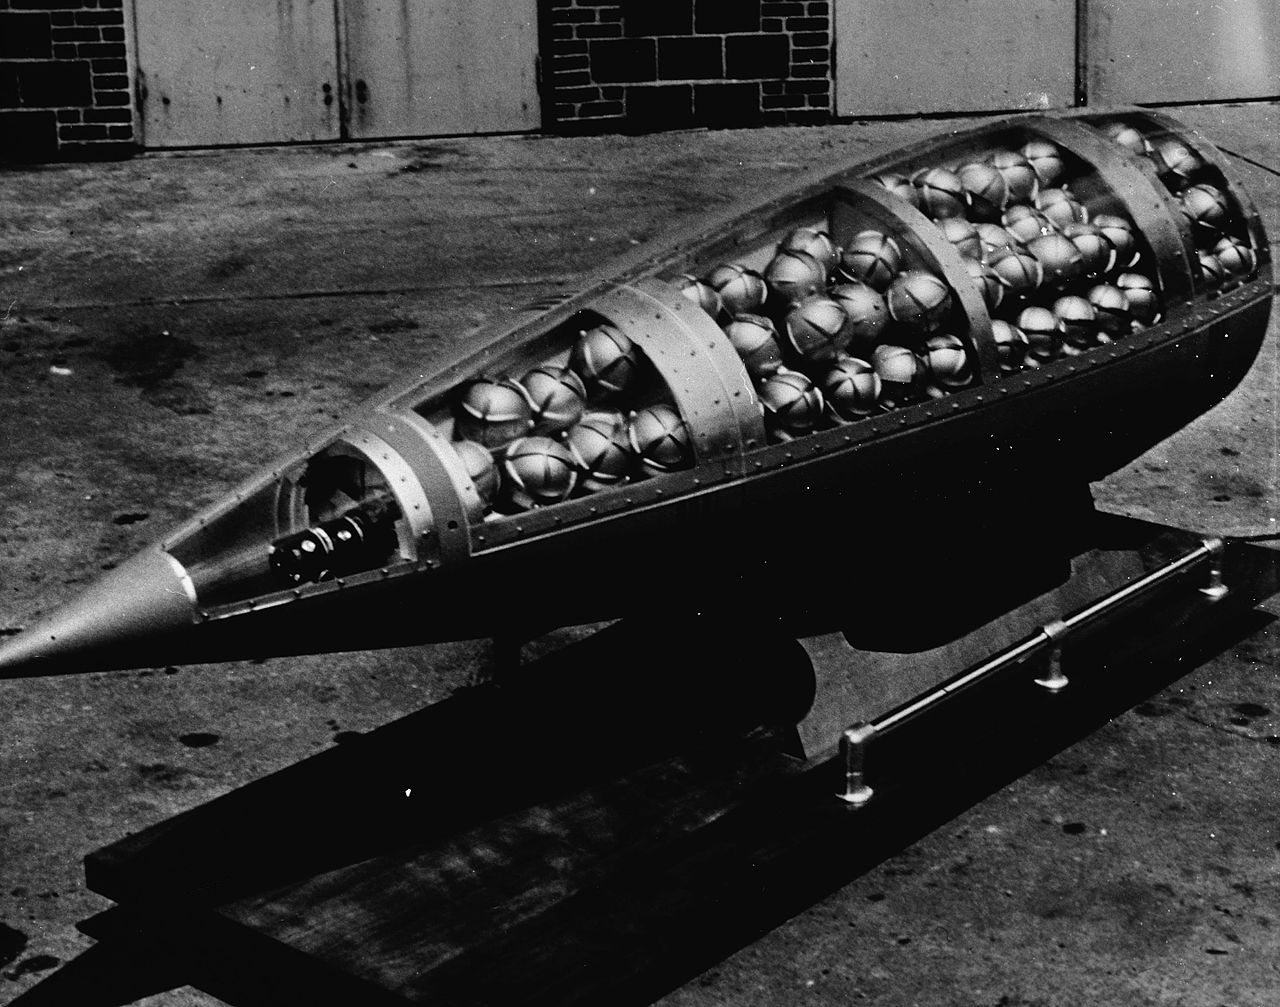 [Image: 1280px-Demonstration_cluster_bomb.jpg]